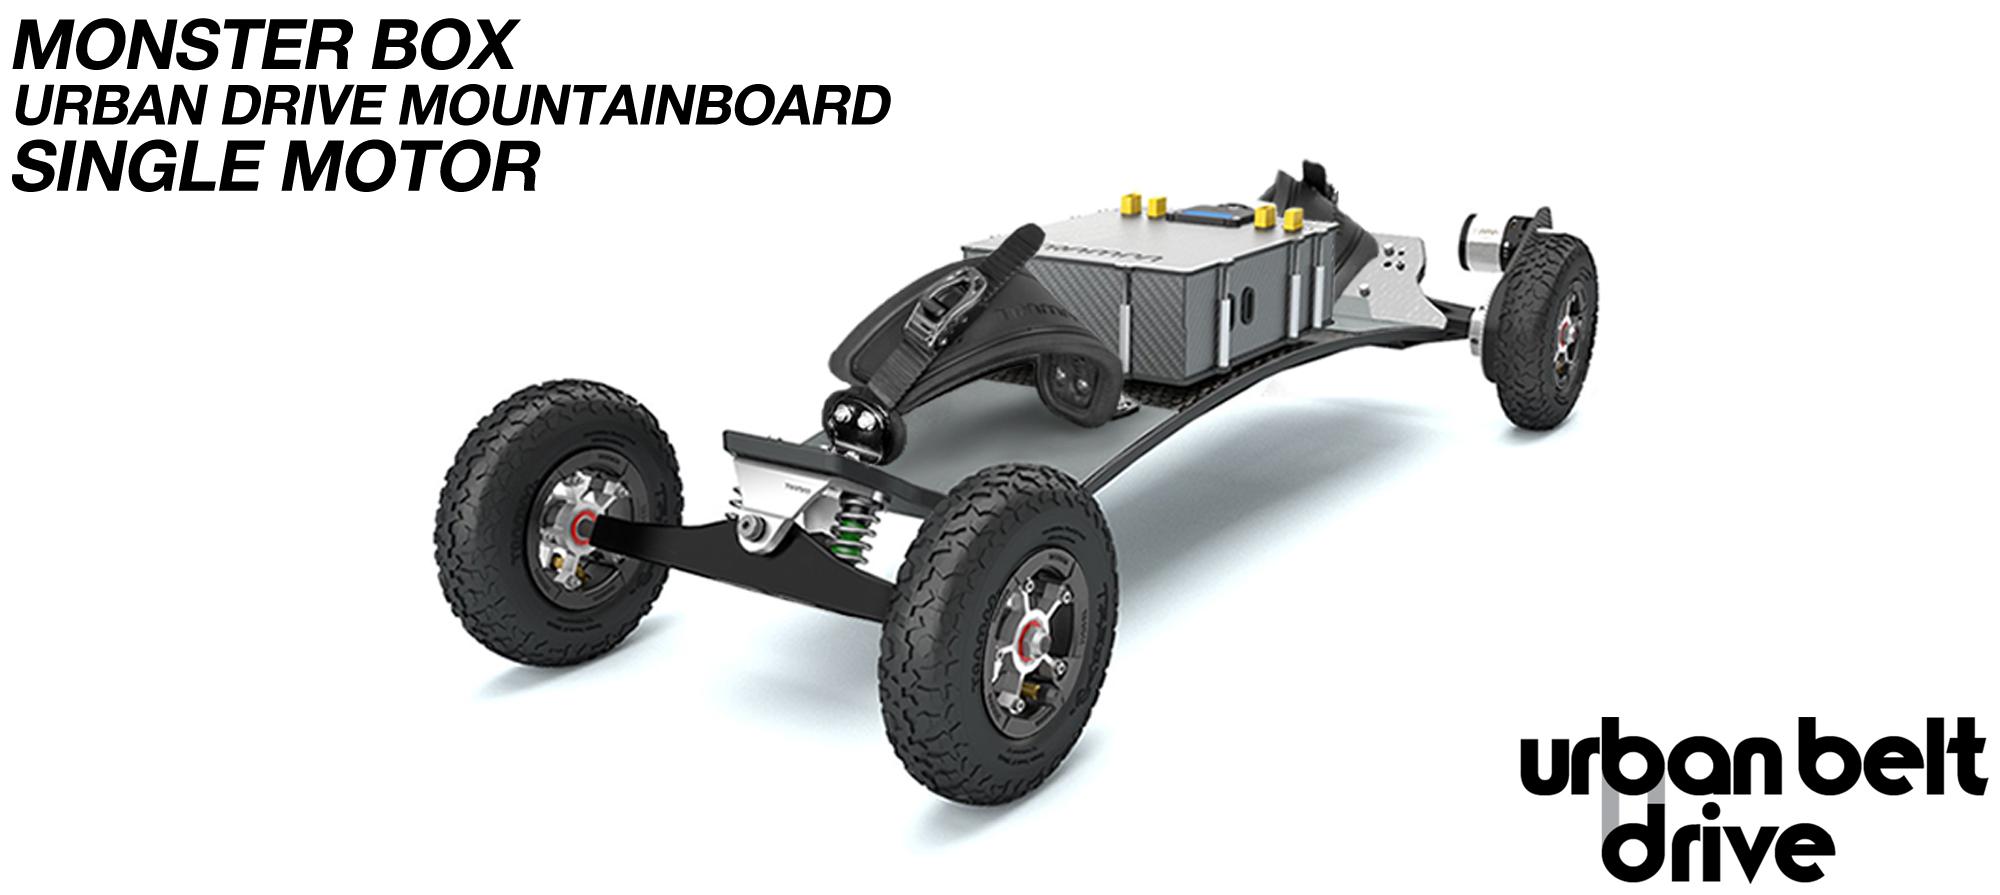 URBAN Electric Mountainboard - Single Motor Urban Motor Mounts, ATB Trucks, 8 inch Wheels, MONSTER Box inc VESC